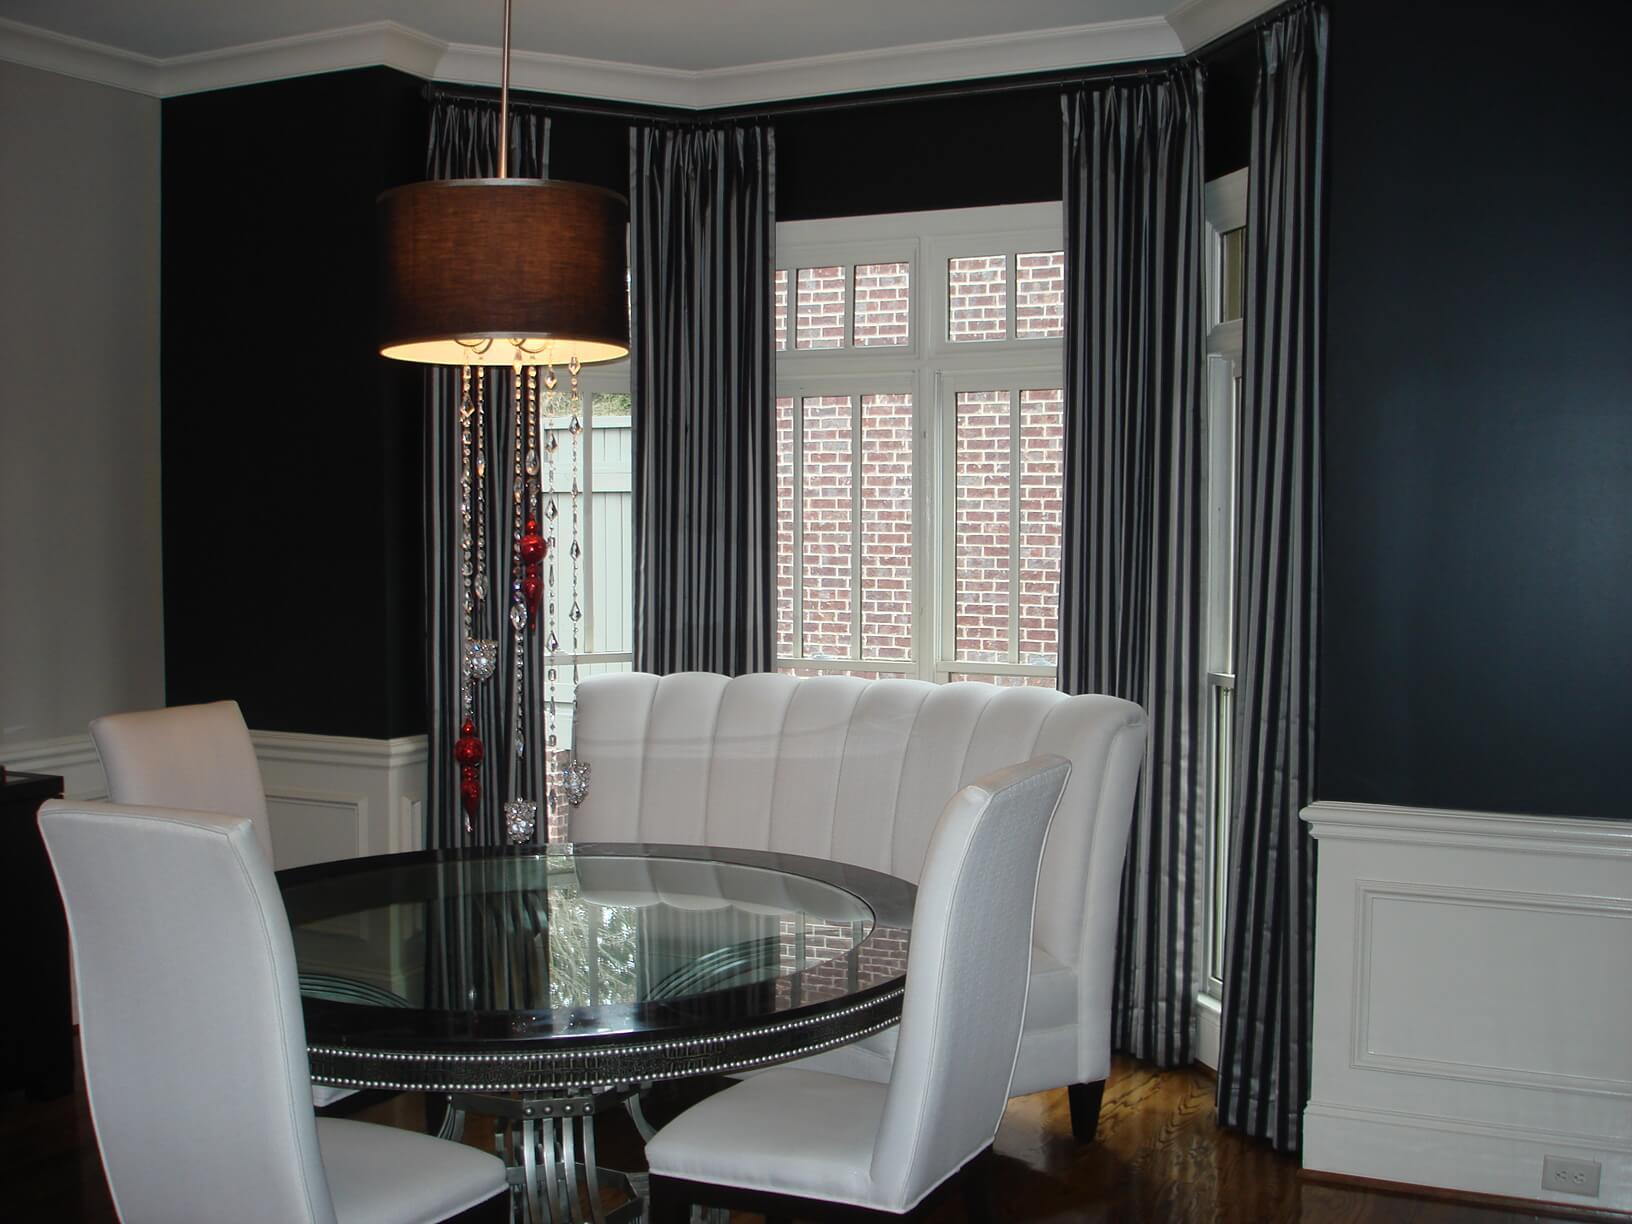 custom-blinds-drapery-shades-interior-design-atlanta-georgia-41.JPG